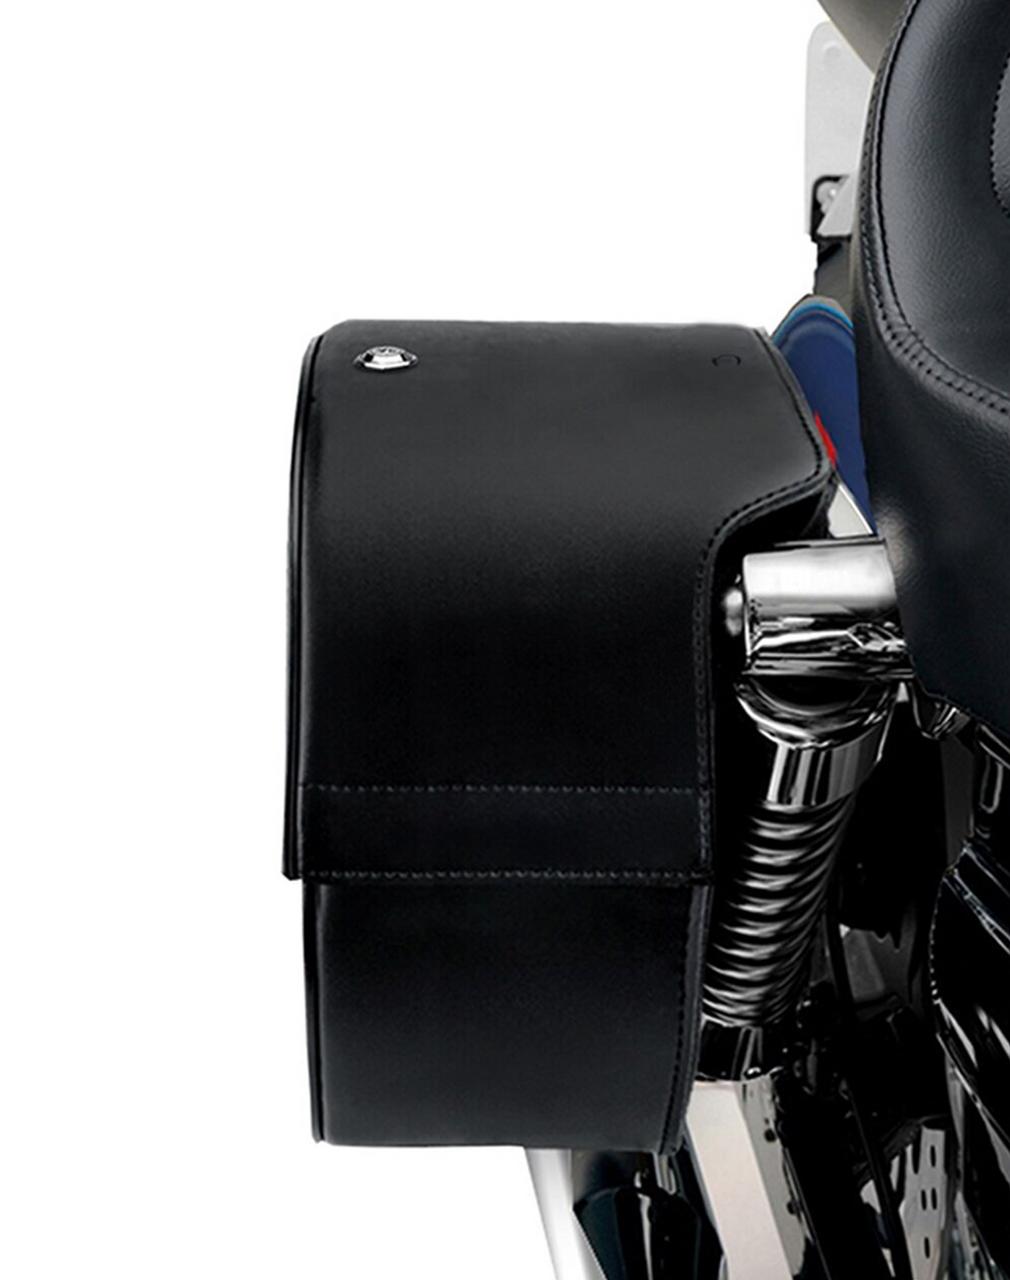 Honda 1500 Valkyrie Interstate Vikingbags Shock Cutout Single Strap Large Slanted Studded Leather Motorcycle Saddlebags Shock Cutout View